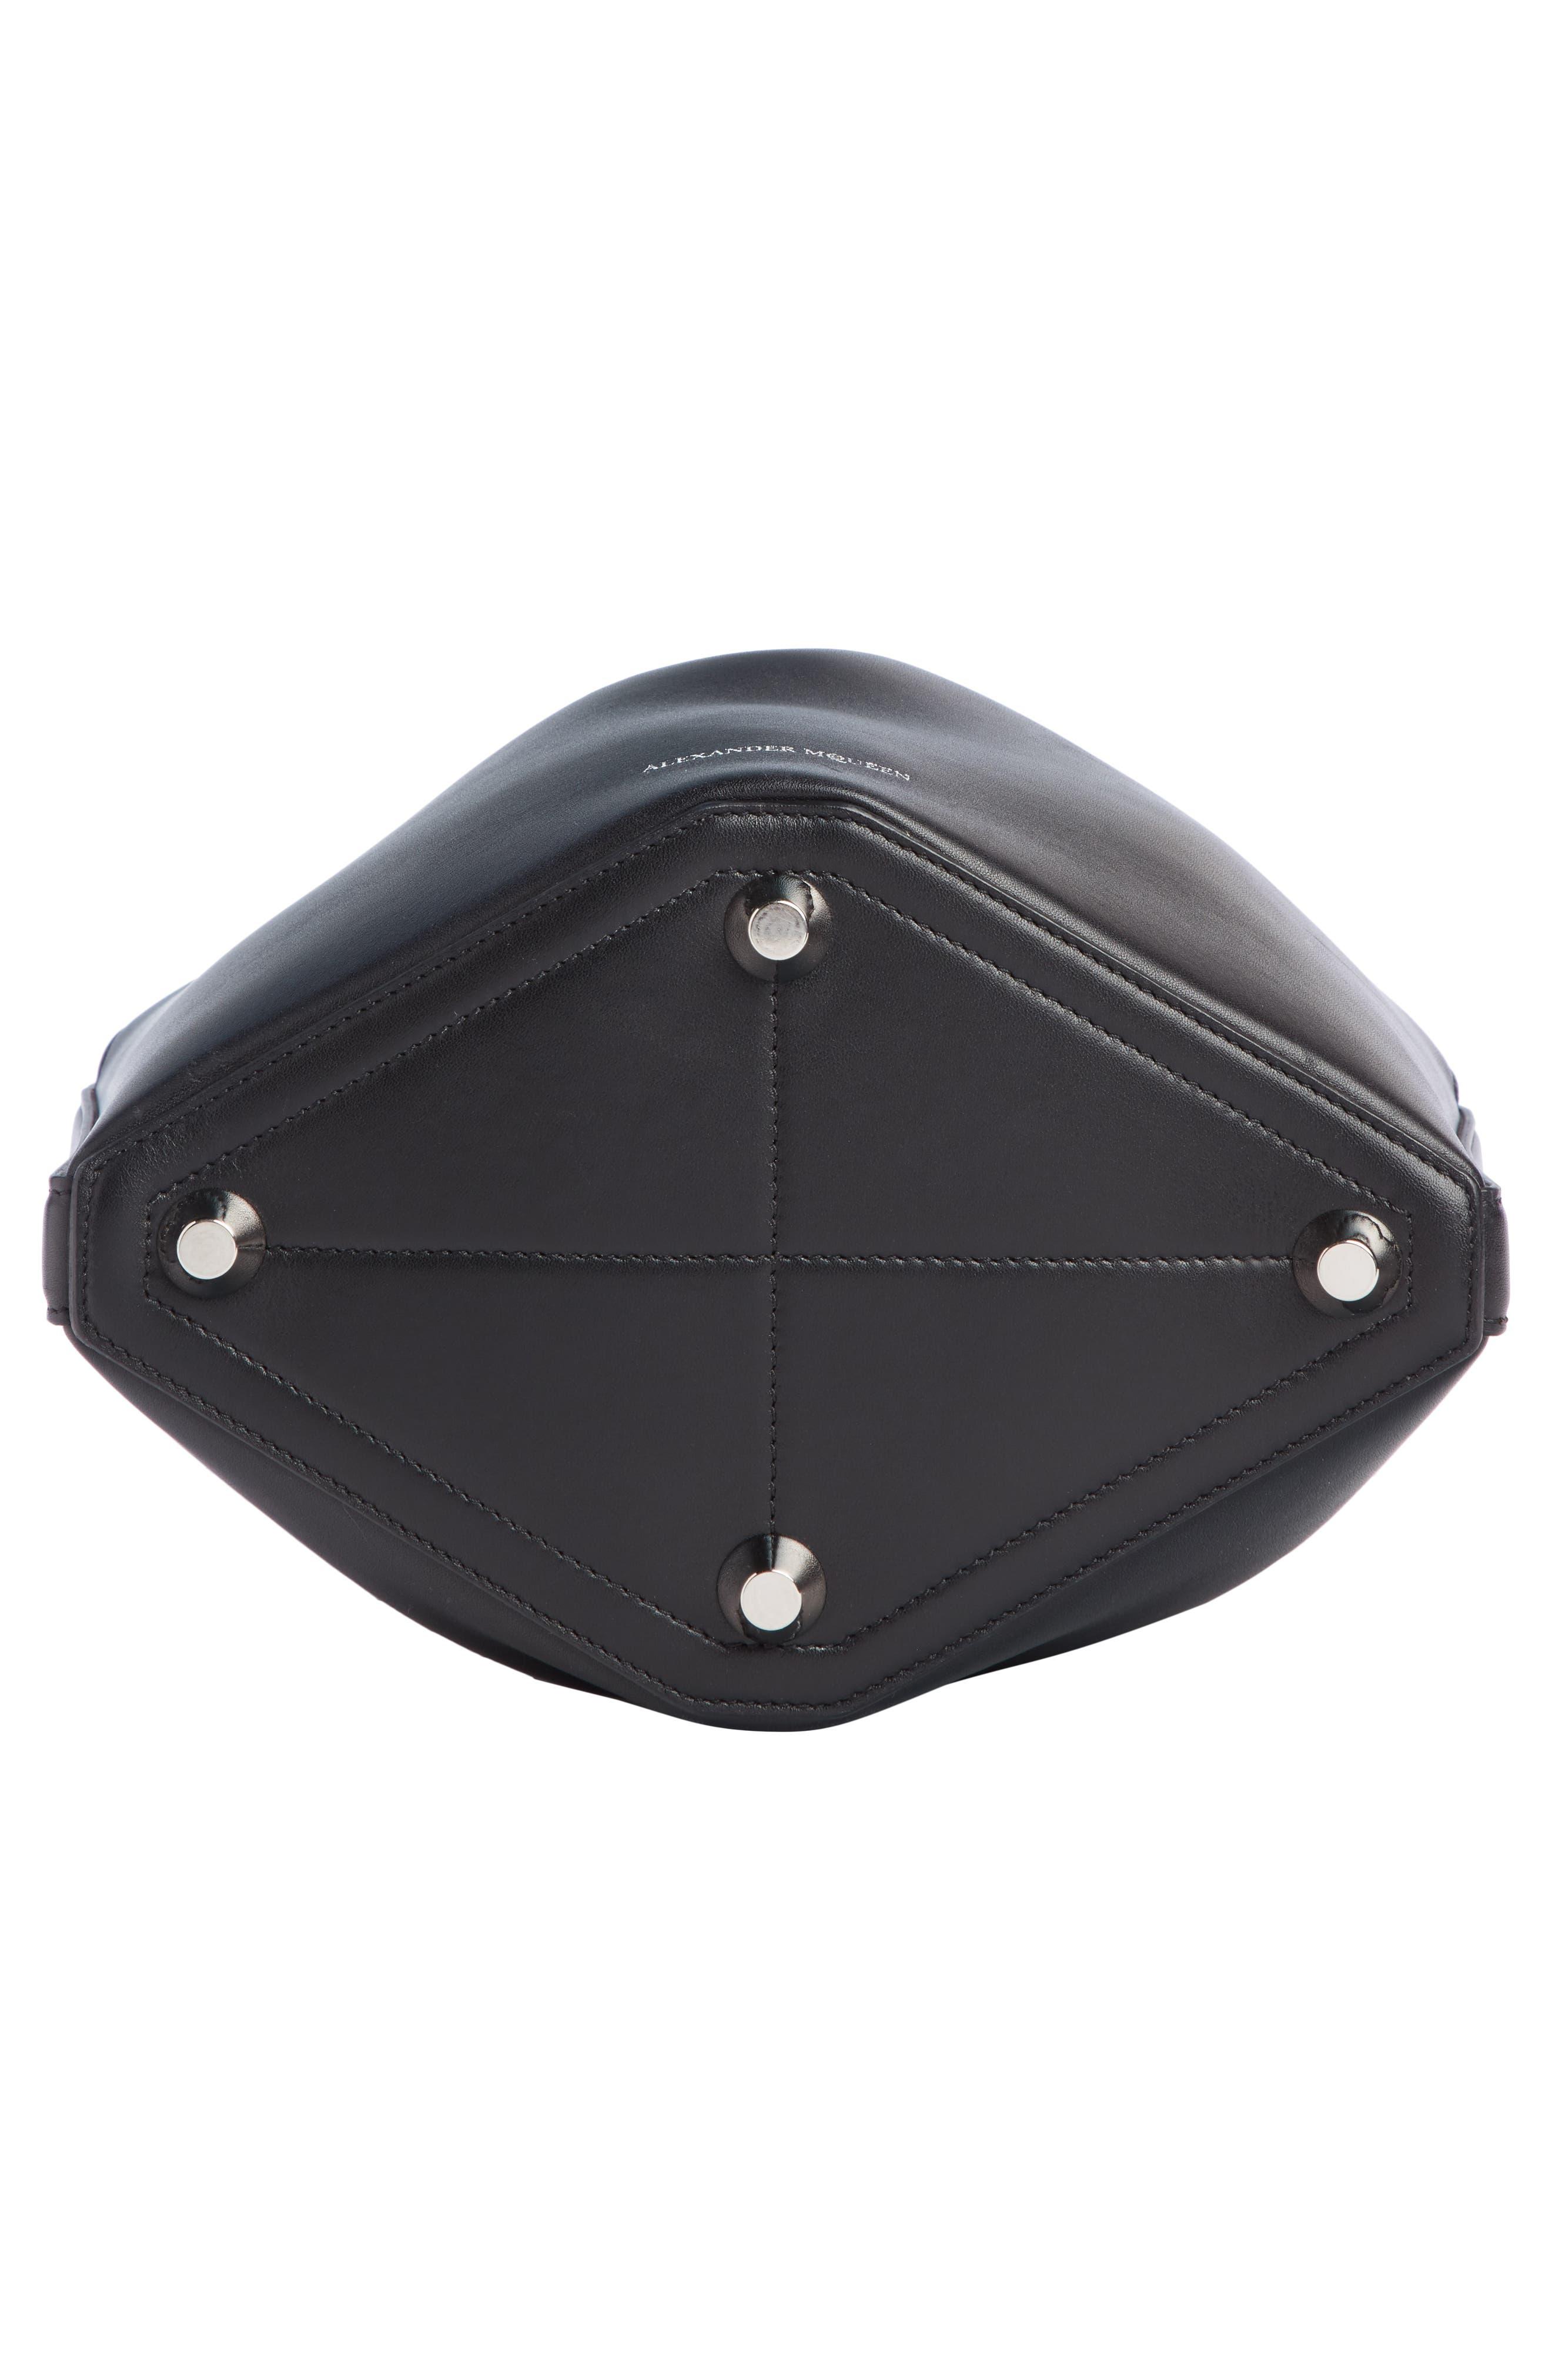 Bicolor Leather Bucket Bag,                             Alternate thumbnail 5, color,                             BLACK/ LUST RED